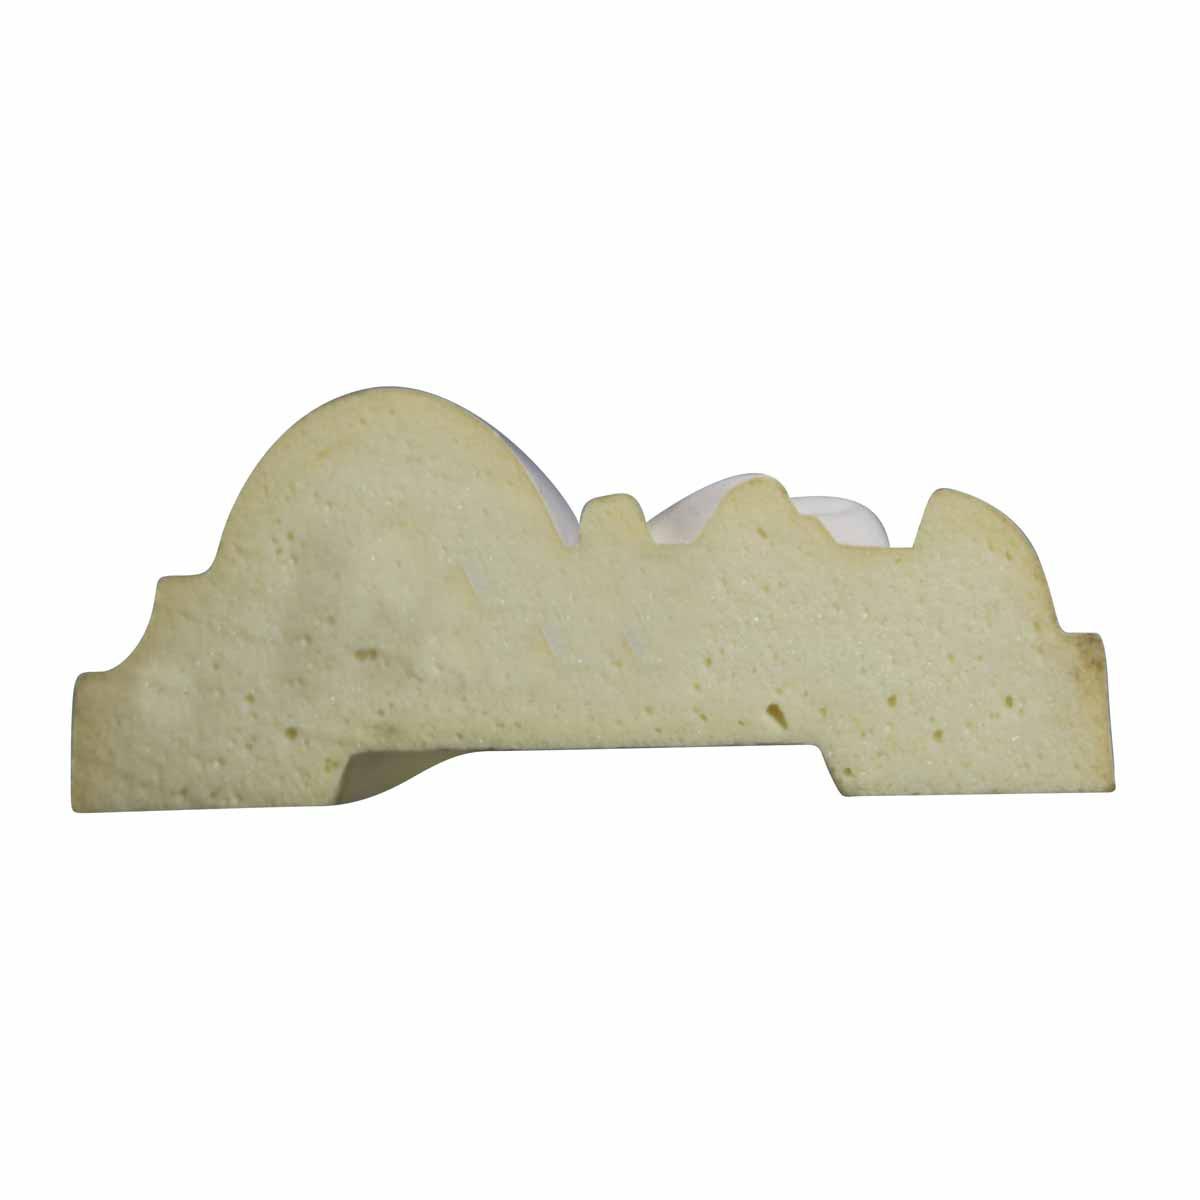 Cornice White Urethane Sample of 11652 23.5 Long Cornice Cornice Moulding Cornice Molding